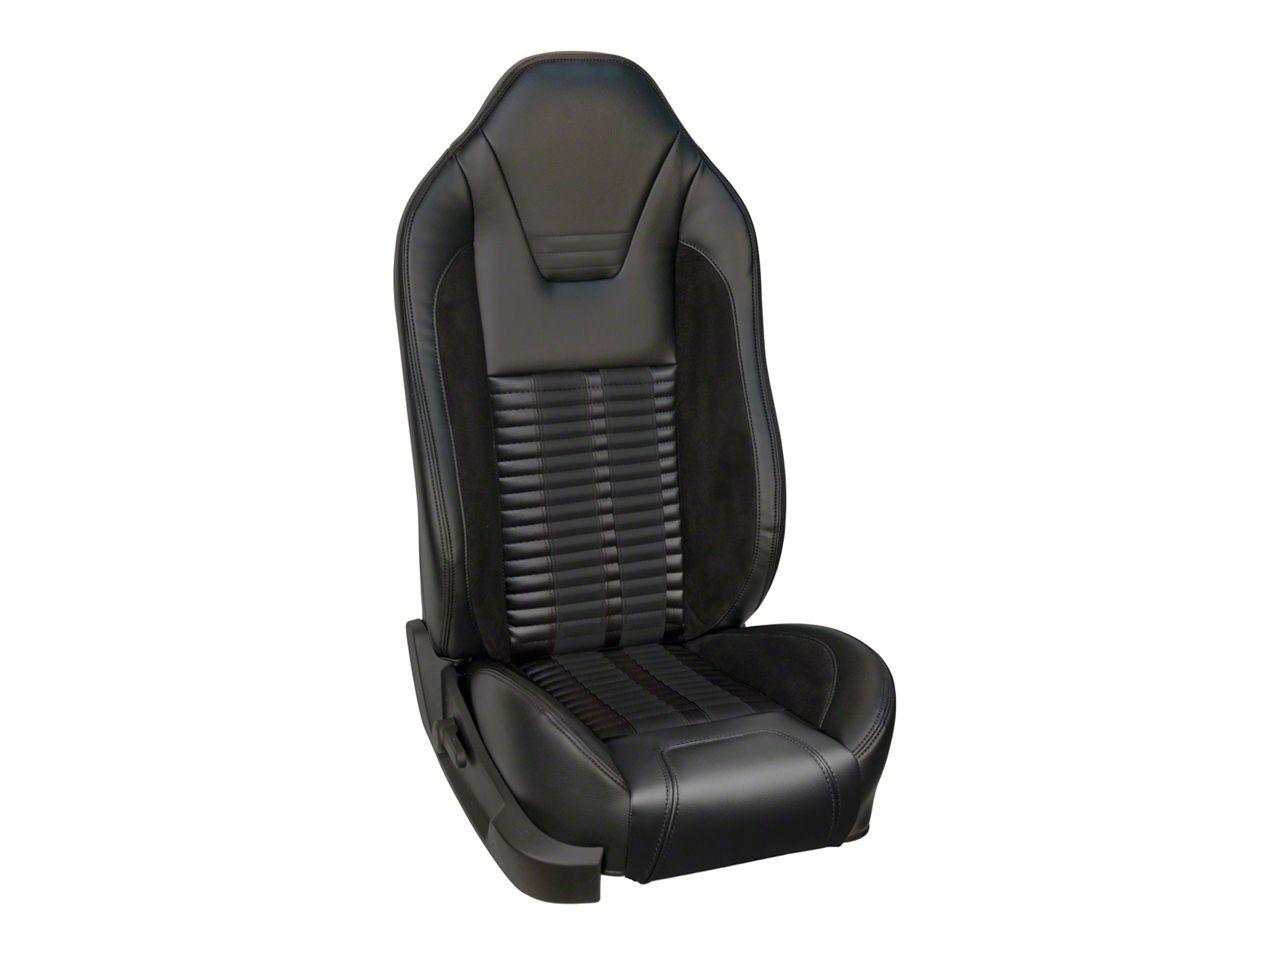 TMI Premium Sport R500 Upholstery & Foam Kit for Airbag Equipped Seats - Black Vinyl & Black Stripe/Stitch (11-12 GT)